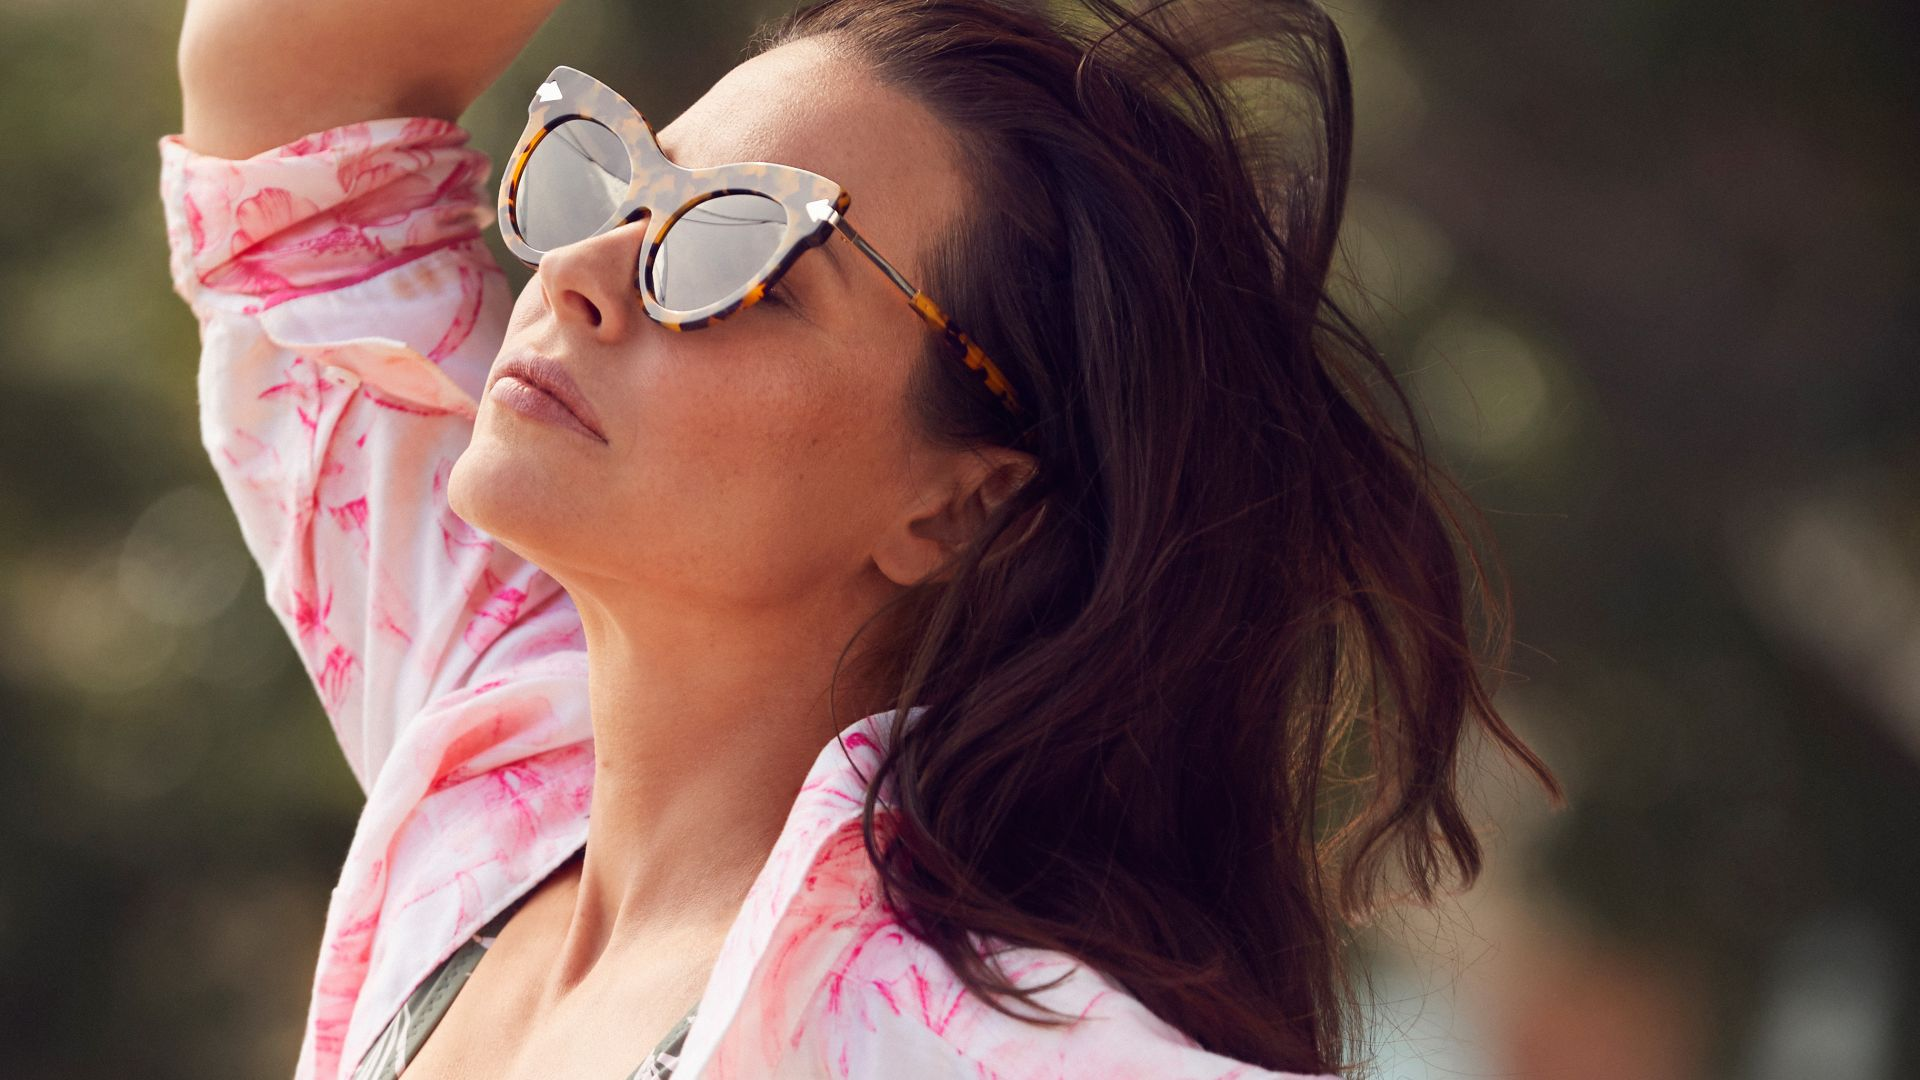 Wallpaper Evangeline Lilly, Nicole Evangeline Lilly ... Rosie Huntington Whiteley Lips